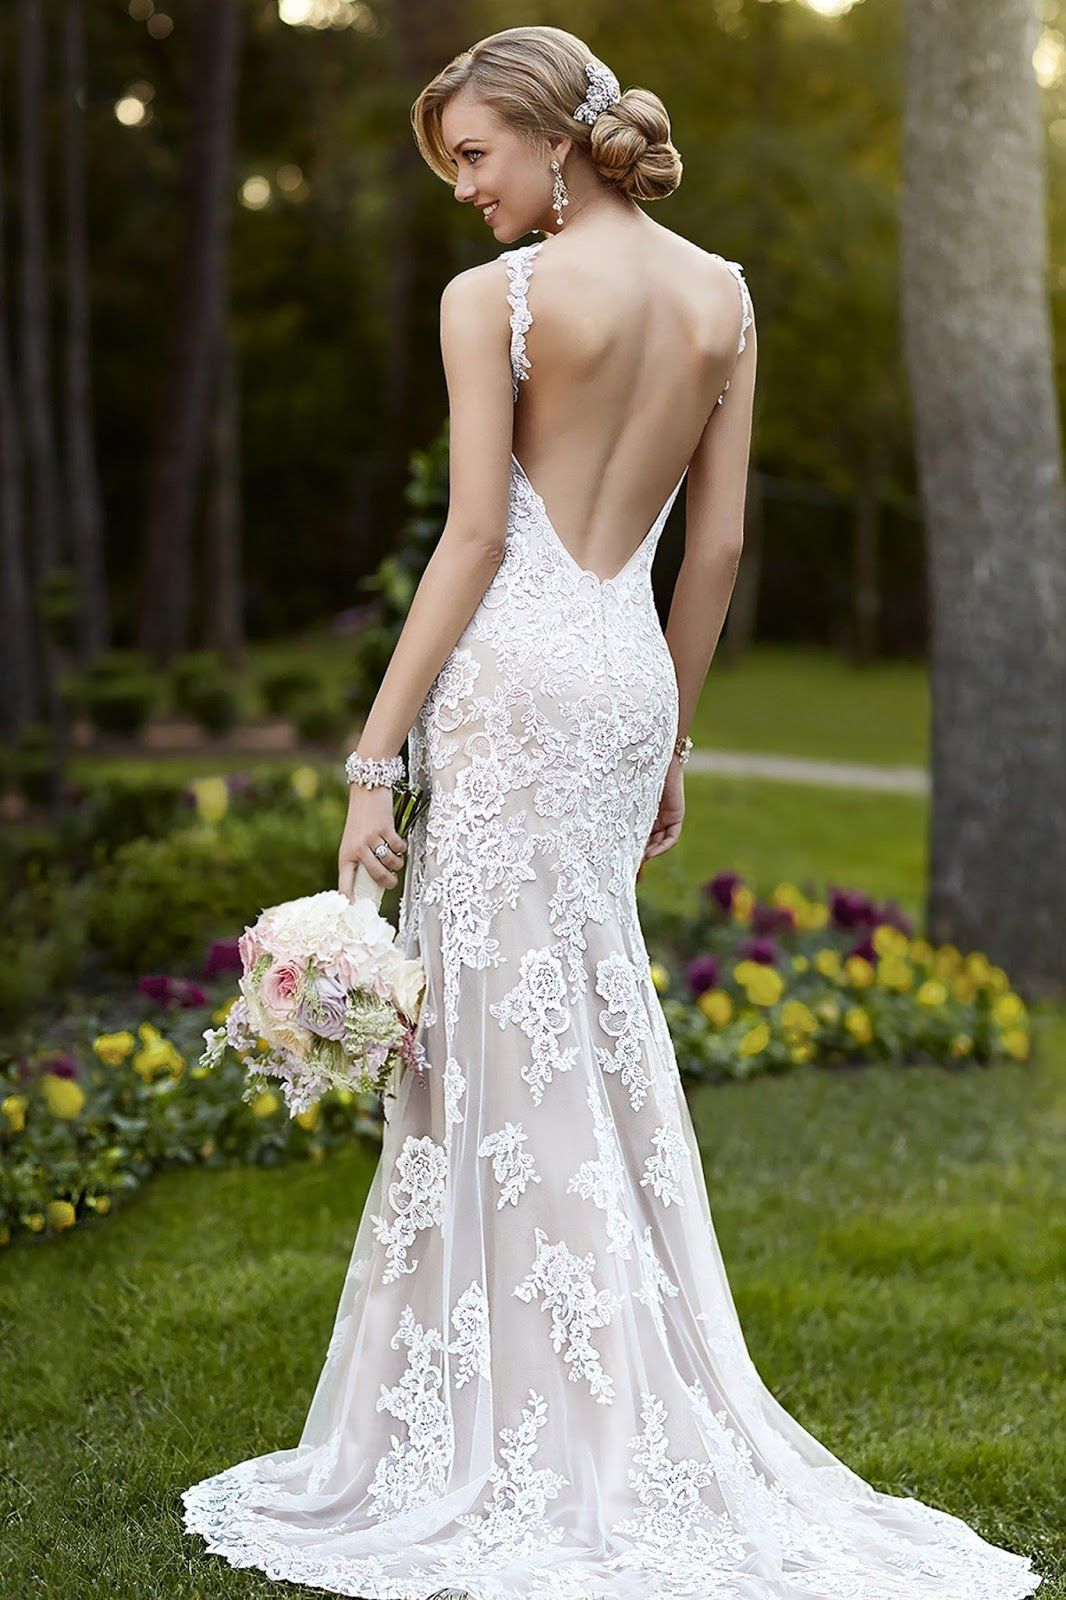 Crochet Wedding Dress Patterns Free | Sari | Pinterest | Crochet ...